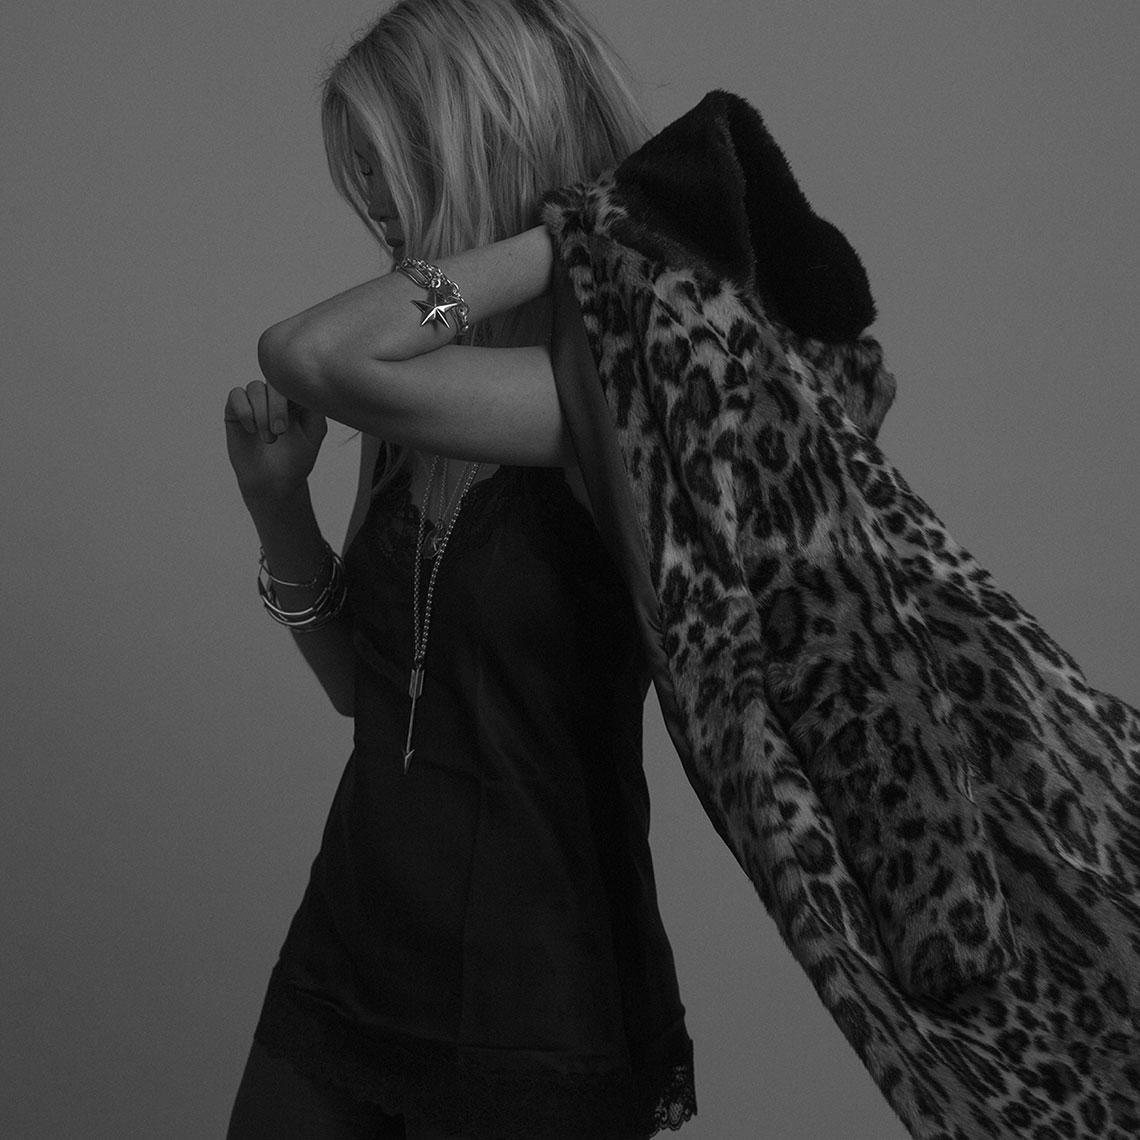 Tilly Sveaas珠宝VI设计,模特摄影